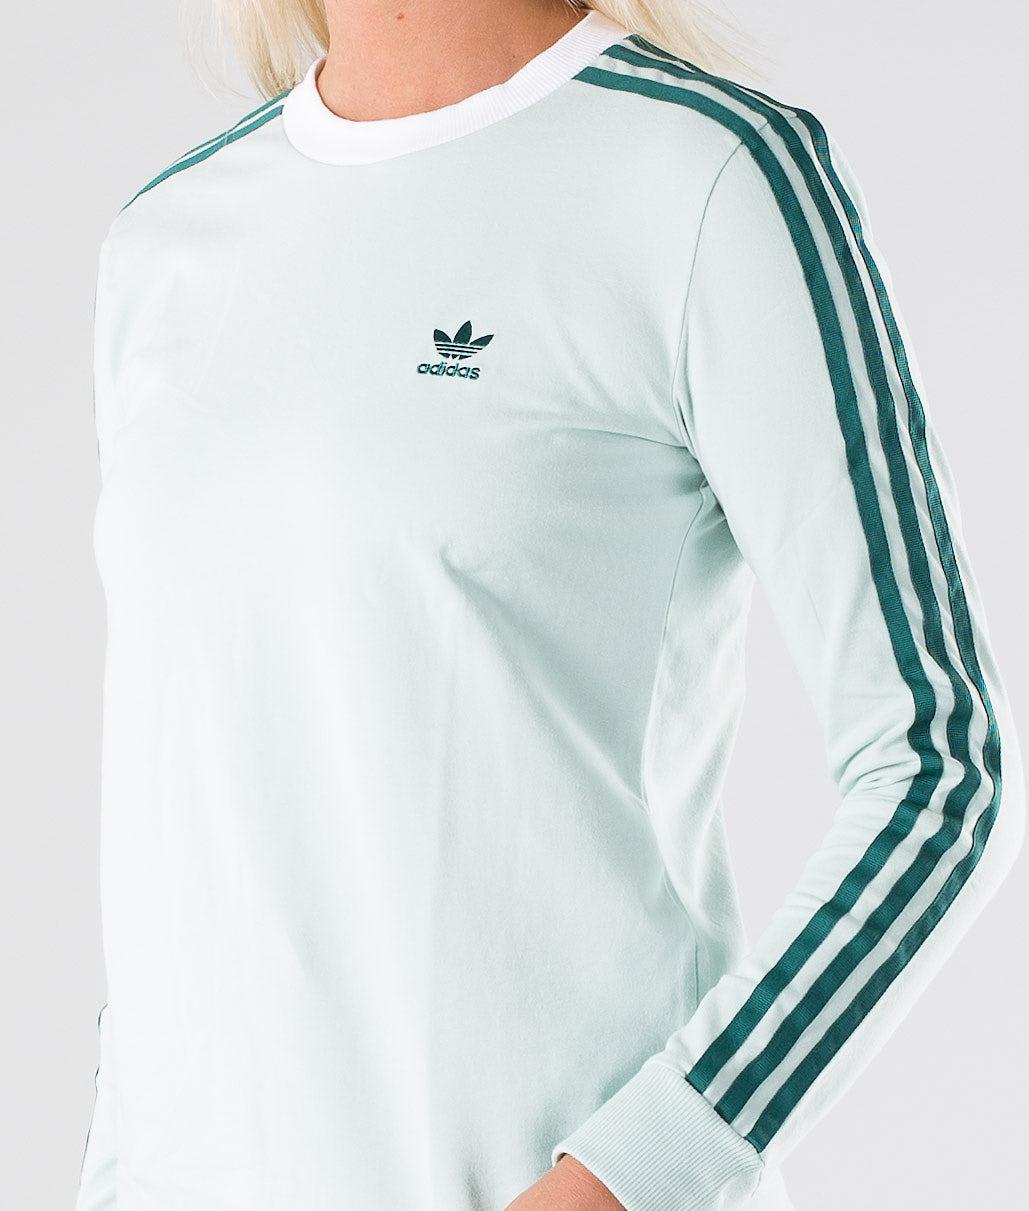 Adidas Originals 3-Stripes Long Sleeve Tee Longsleeve Vapour Green